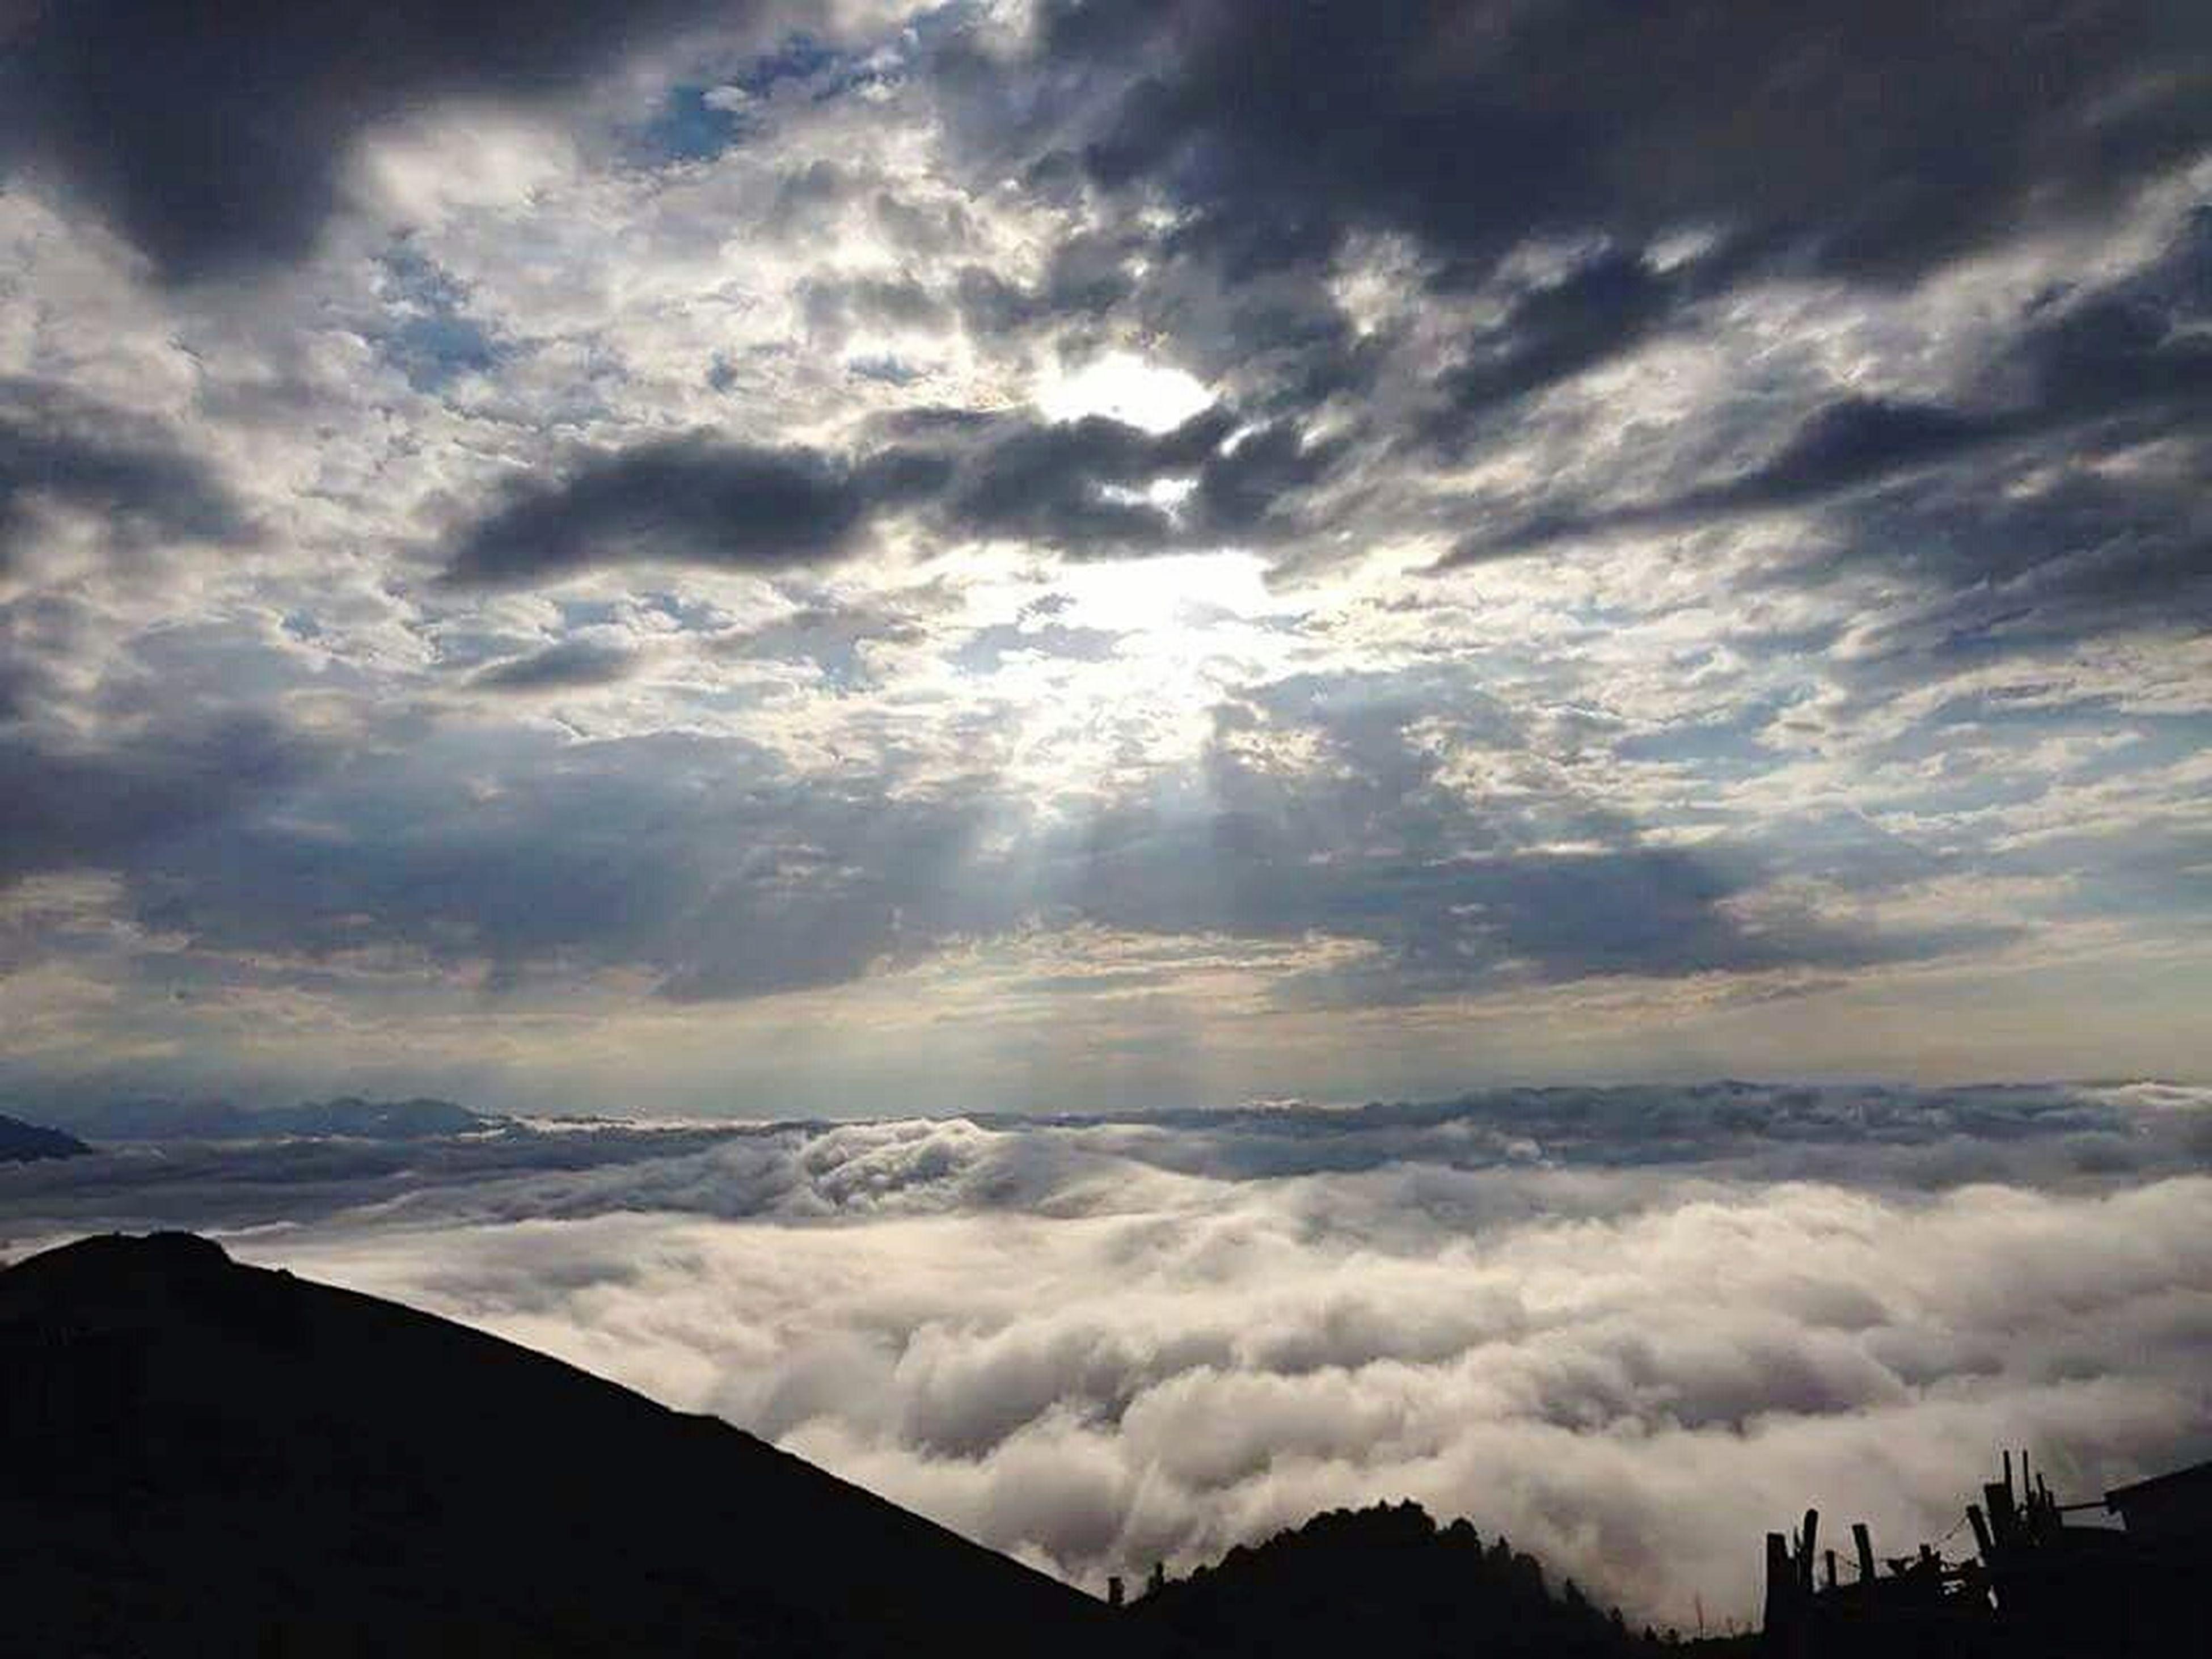 scenics, sky, cloud - sky, tranquil scene, beauty in nature, tranquility, mountain, silhouette, cloudy, weather, nature, mountain range, landscape, sunset, cloud, idyllic, cloudscape, dramatic sky, majestic, overcast